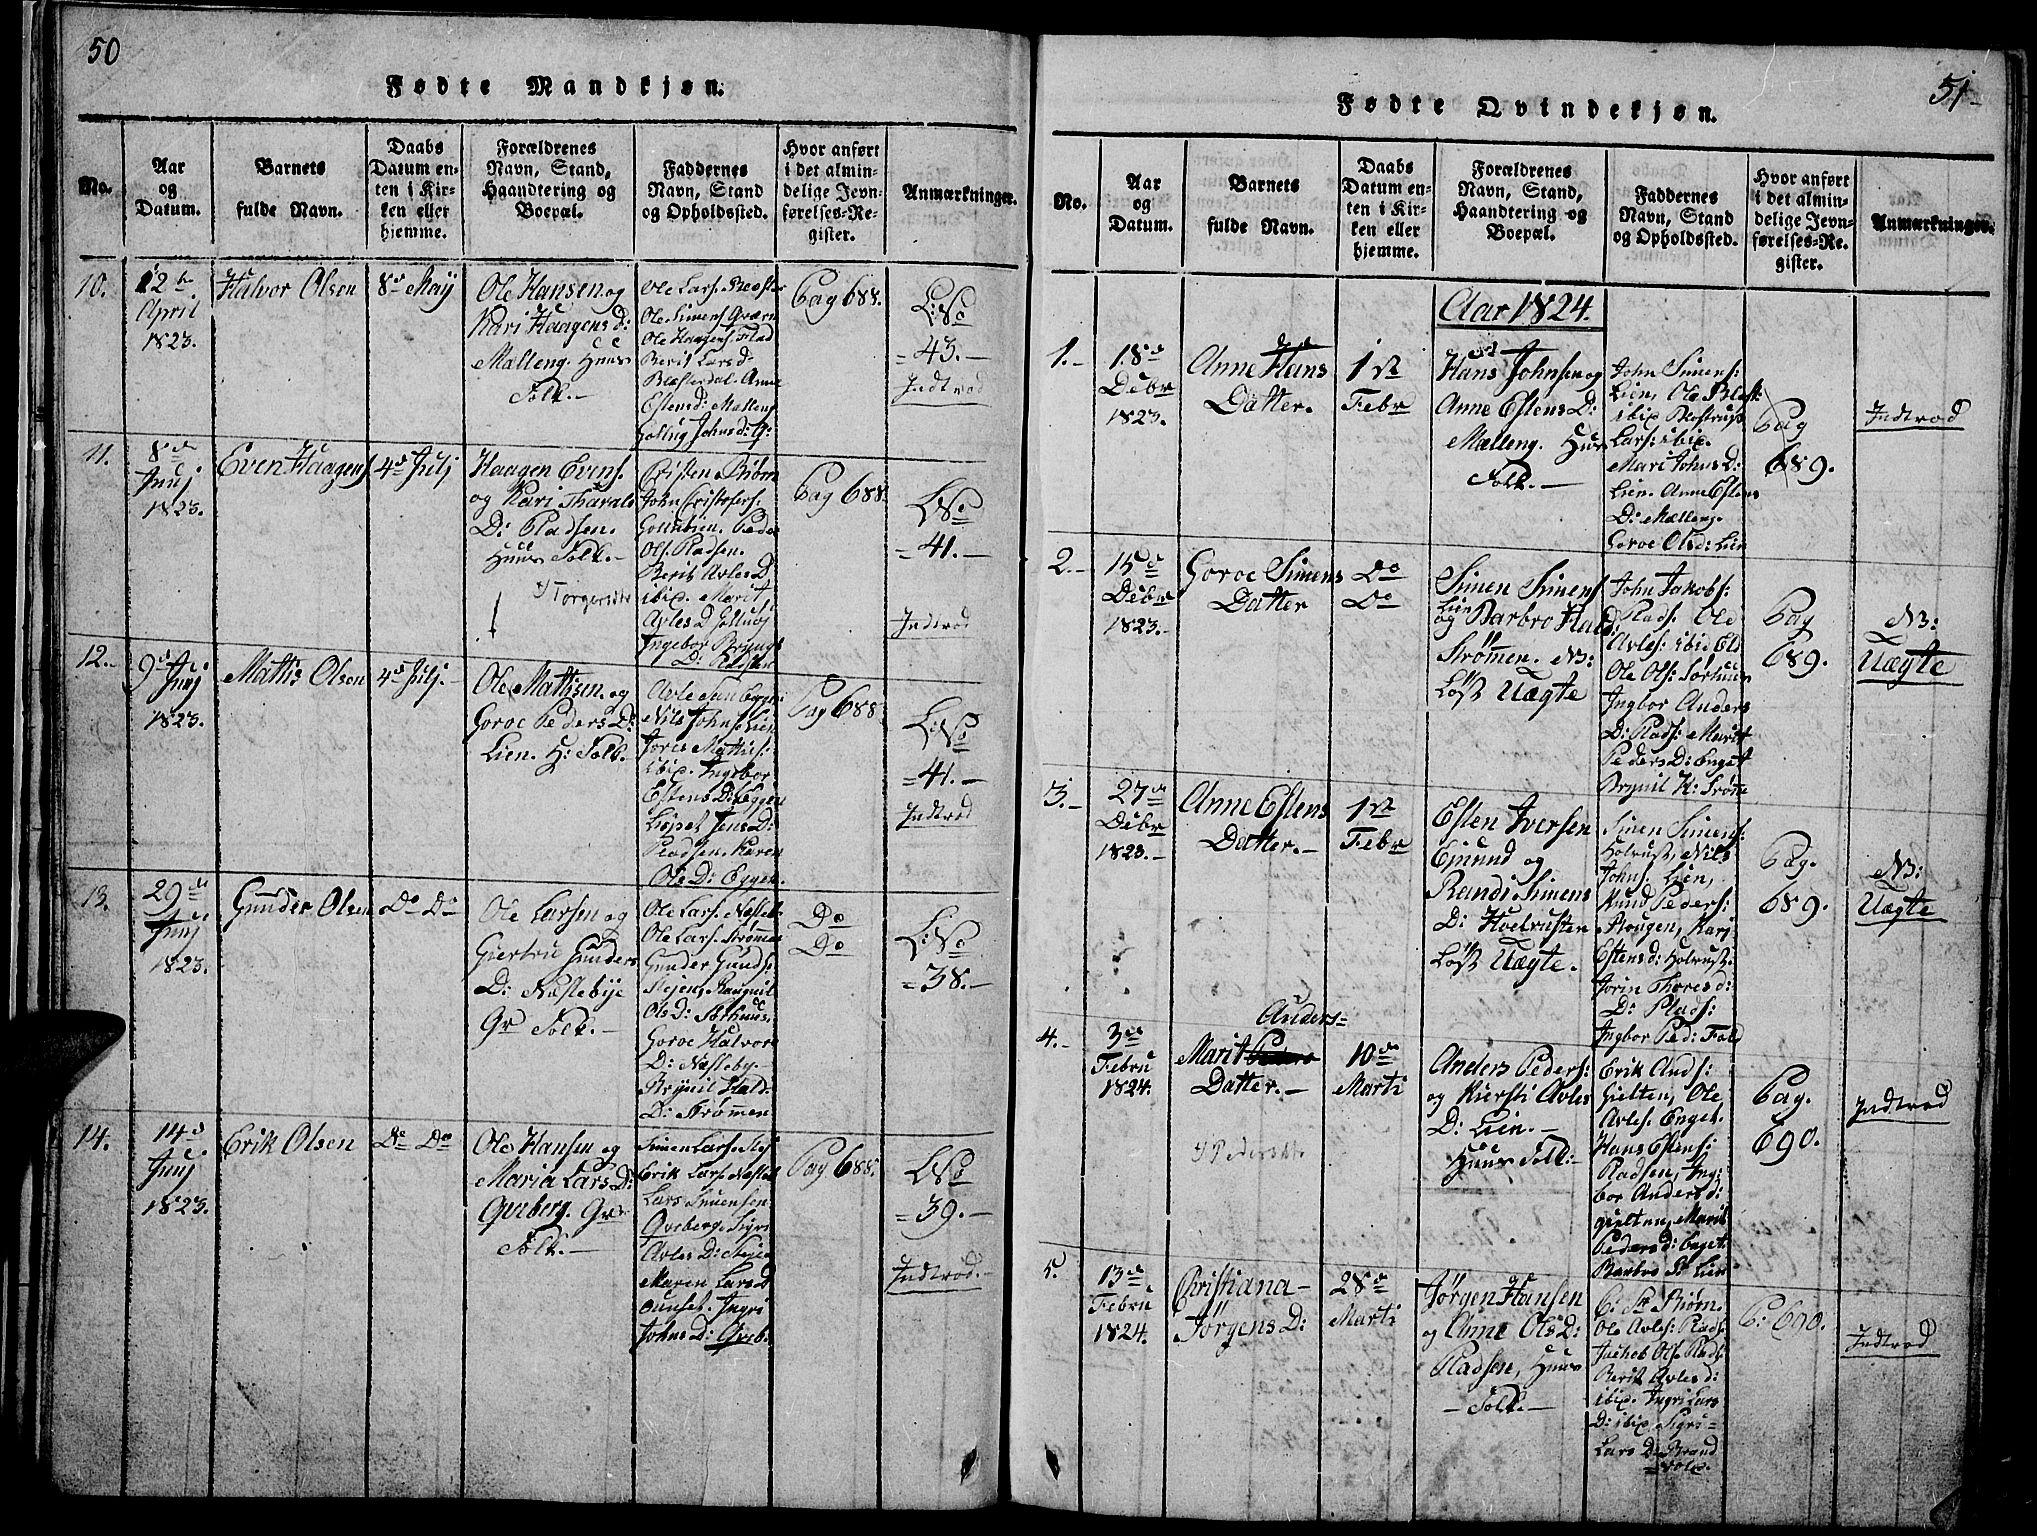 SAH, Tynset prestekontor, Klokkerbok nr. 2, 1814-1862, s. 50-51